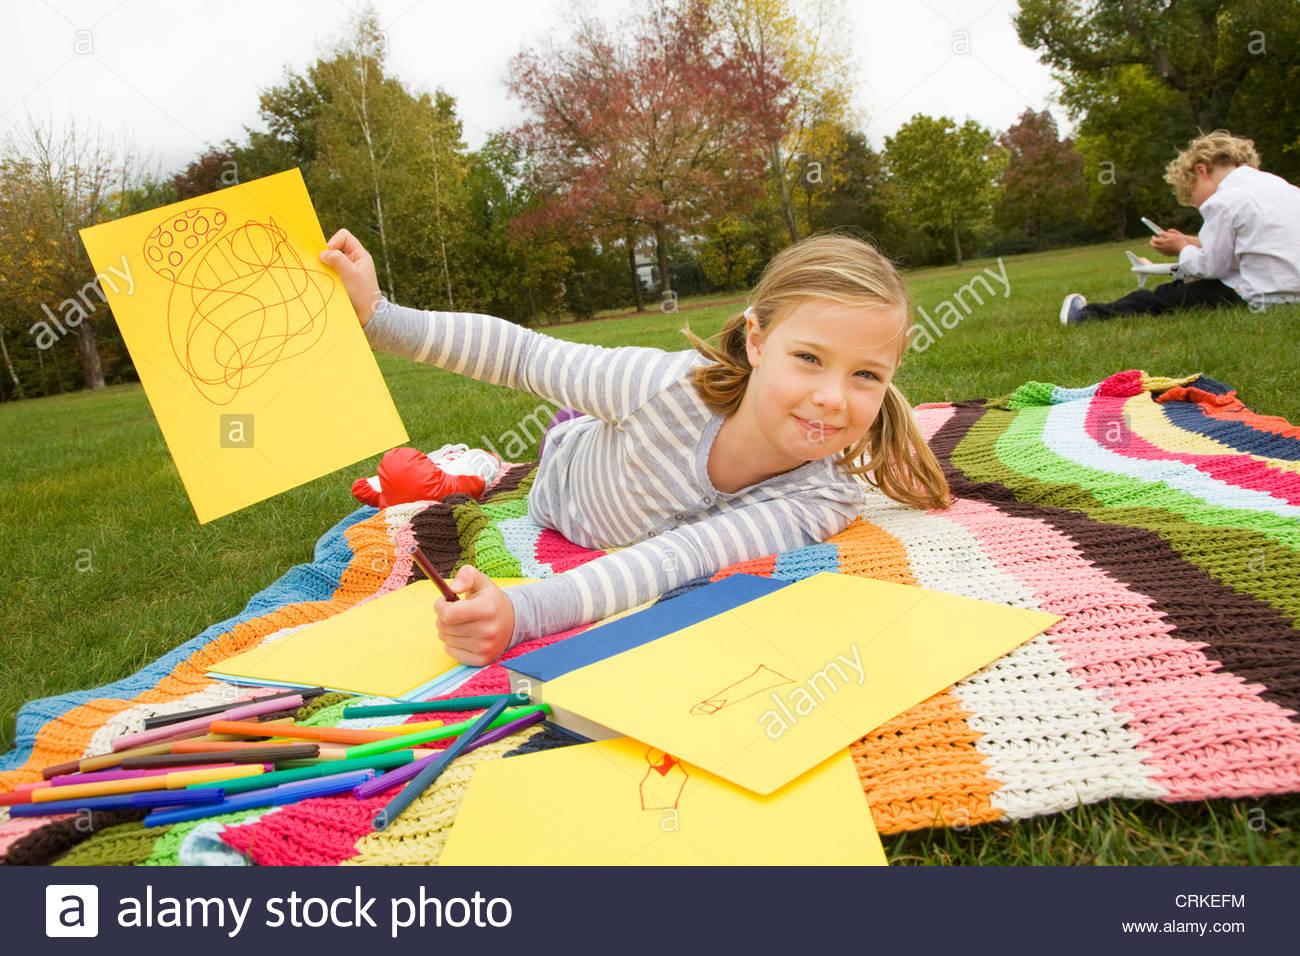 1300x956 Girl Drawing On Picnic Blanket Stock Photo 48986328